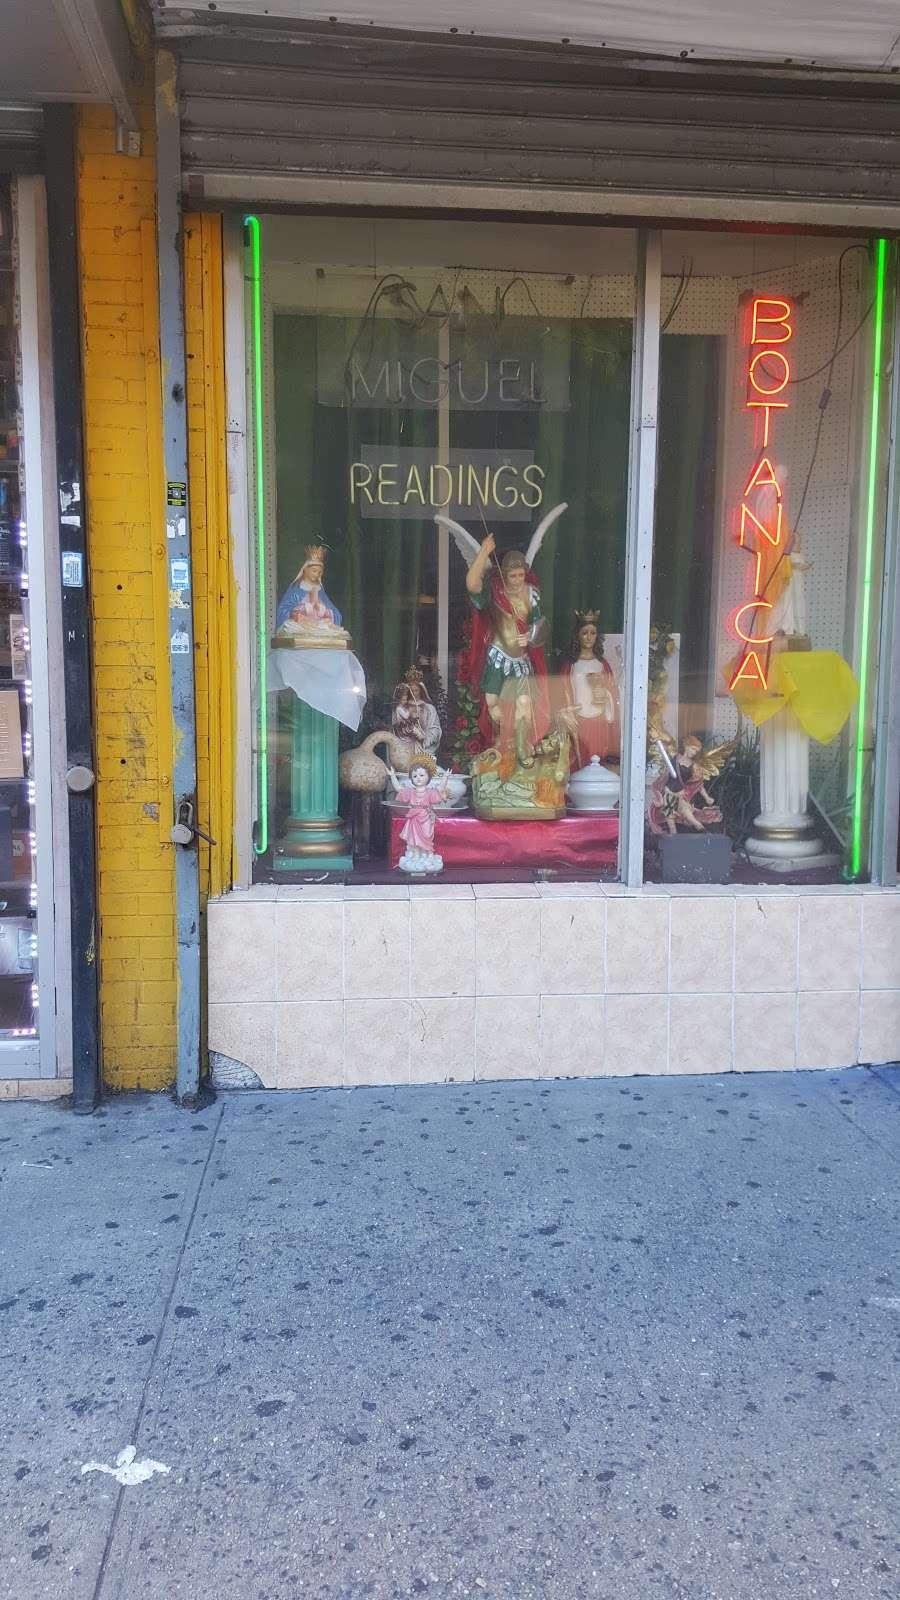 Archangel Botanica - store  | Photo 2 of 10 | Address: 295 E 170th St, Bronx, NY 10456, USA | Phone: (718) 588-5869